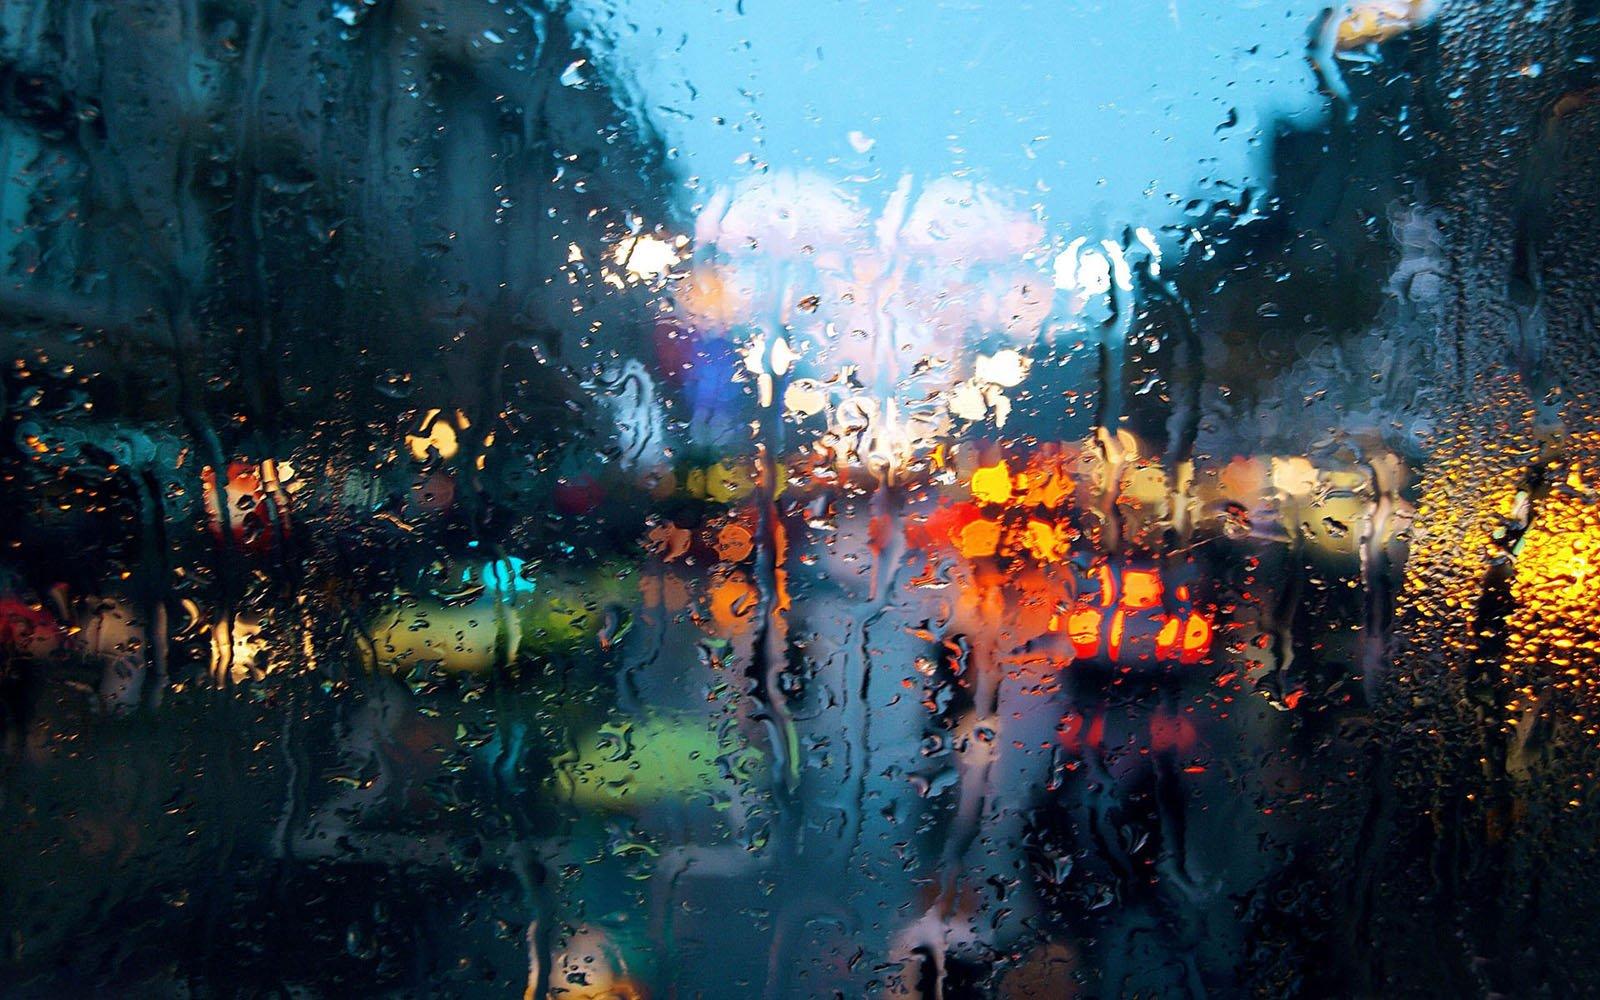 49] Rainy Window Desktop Wallpaper on WallpaperSafari 1600x1000